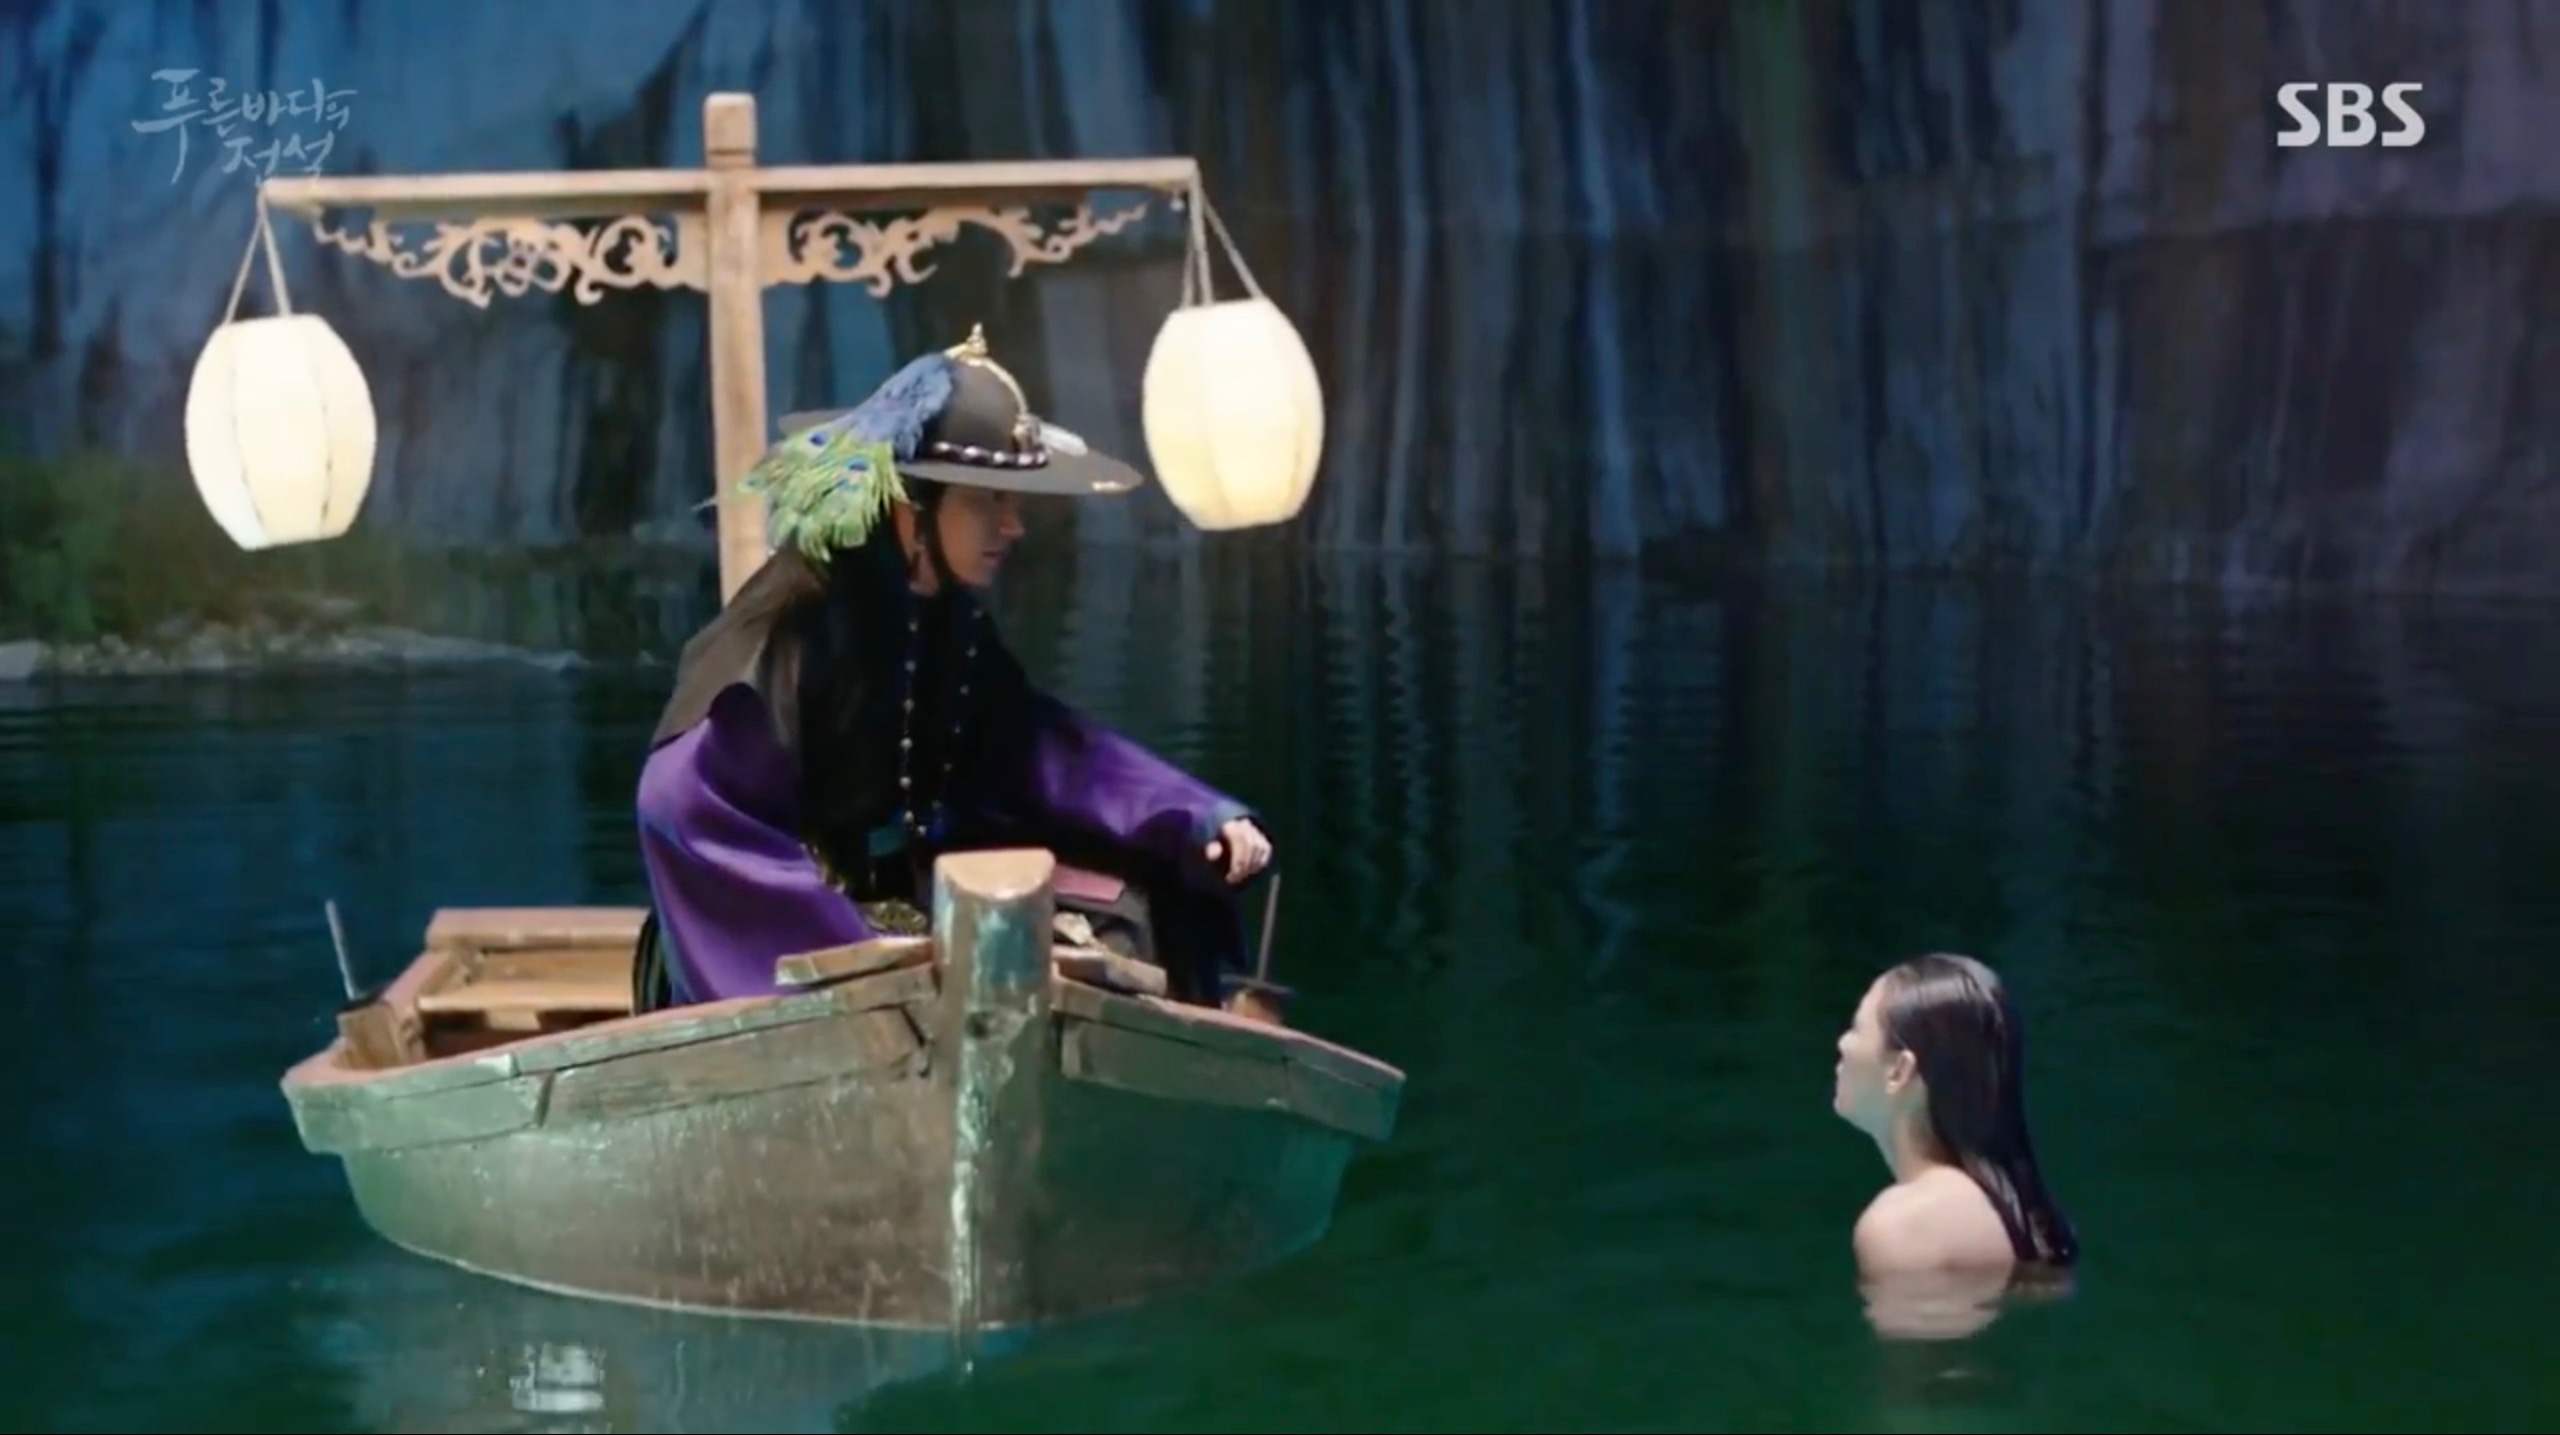 the-legend-of-the-blue-sea-korean-drama-filming-location-episode-3-Pocheon-Art-Valley